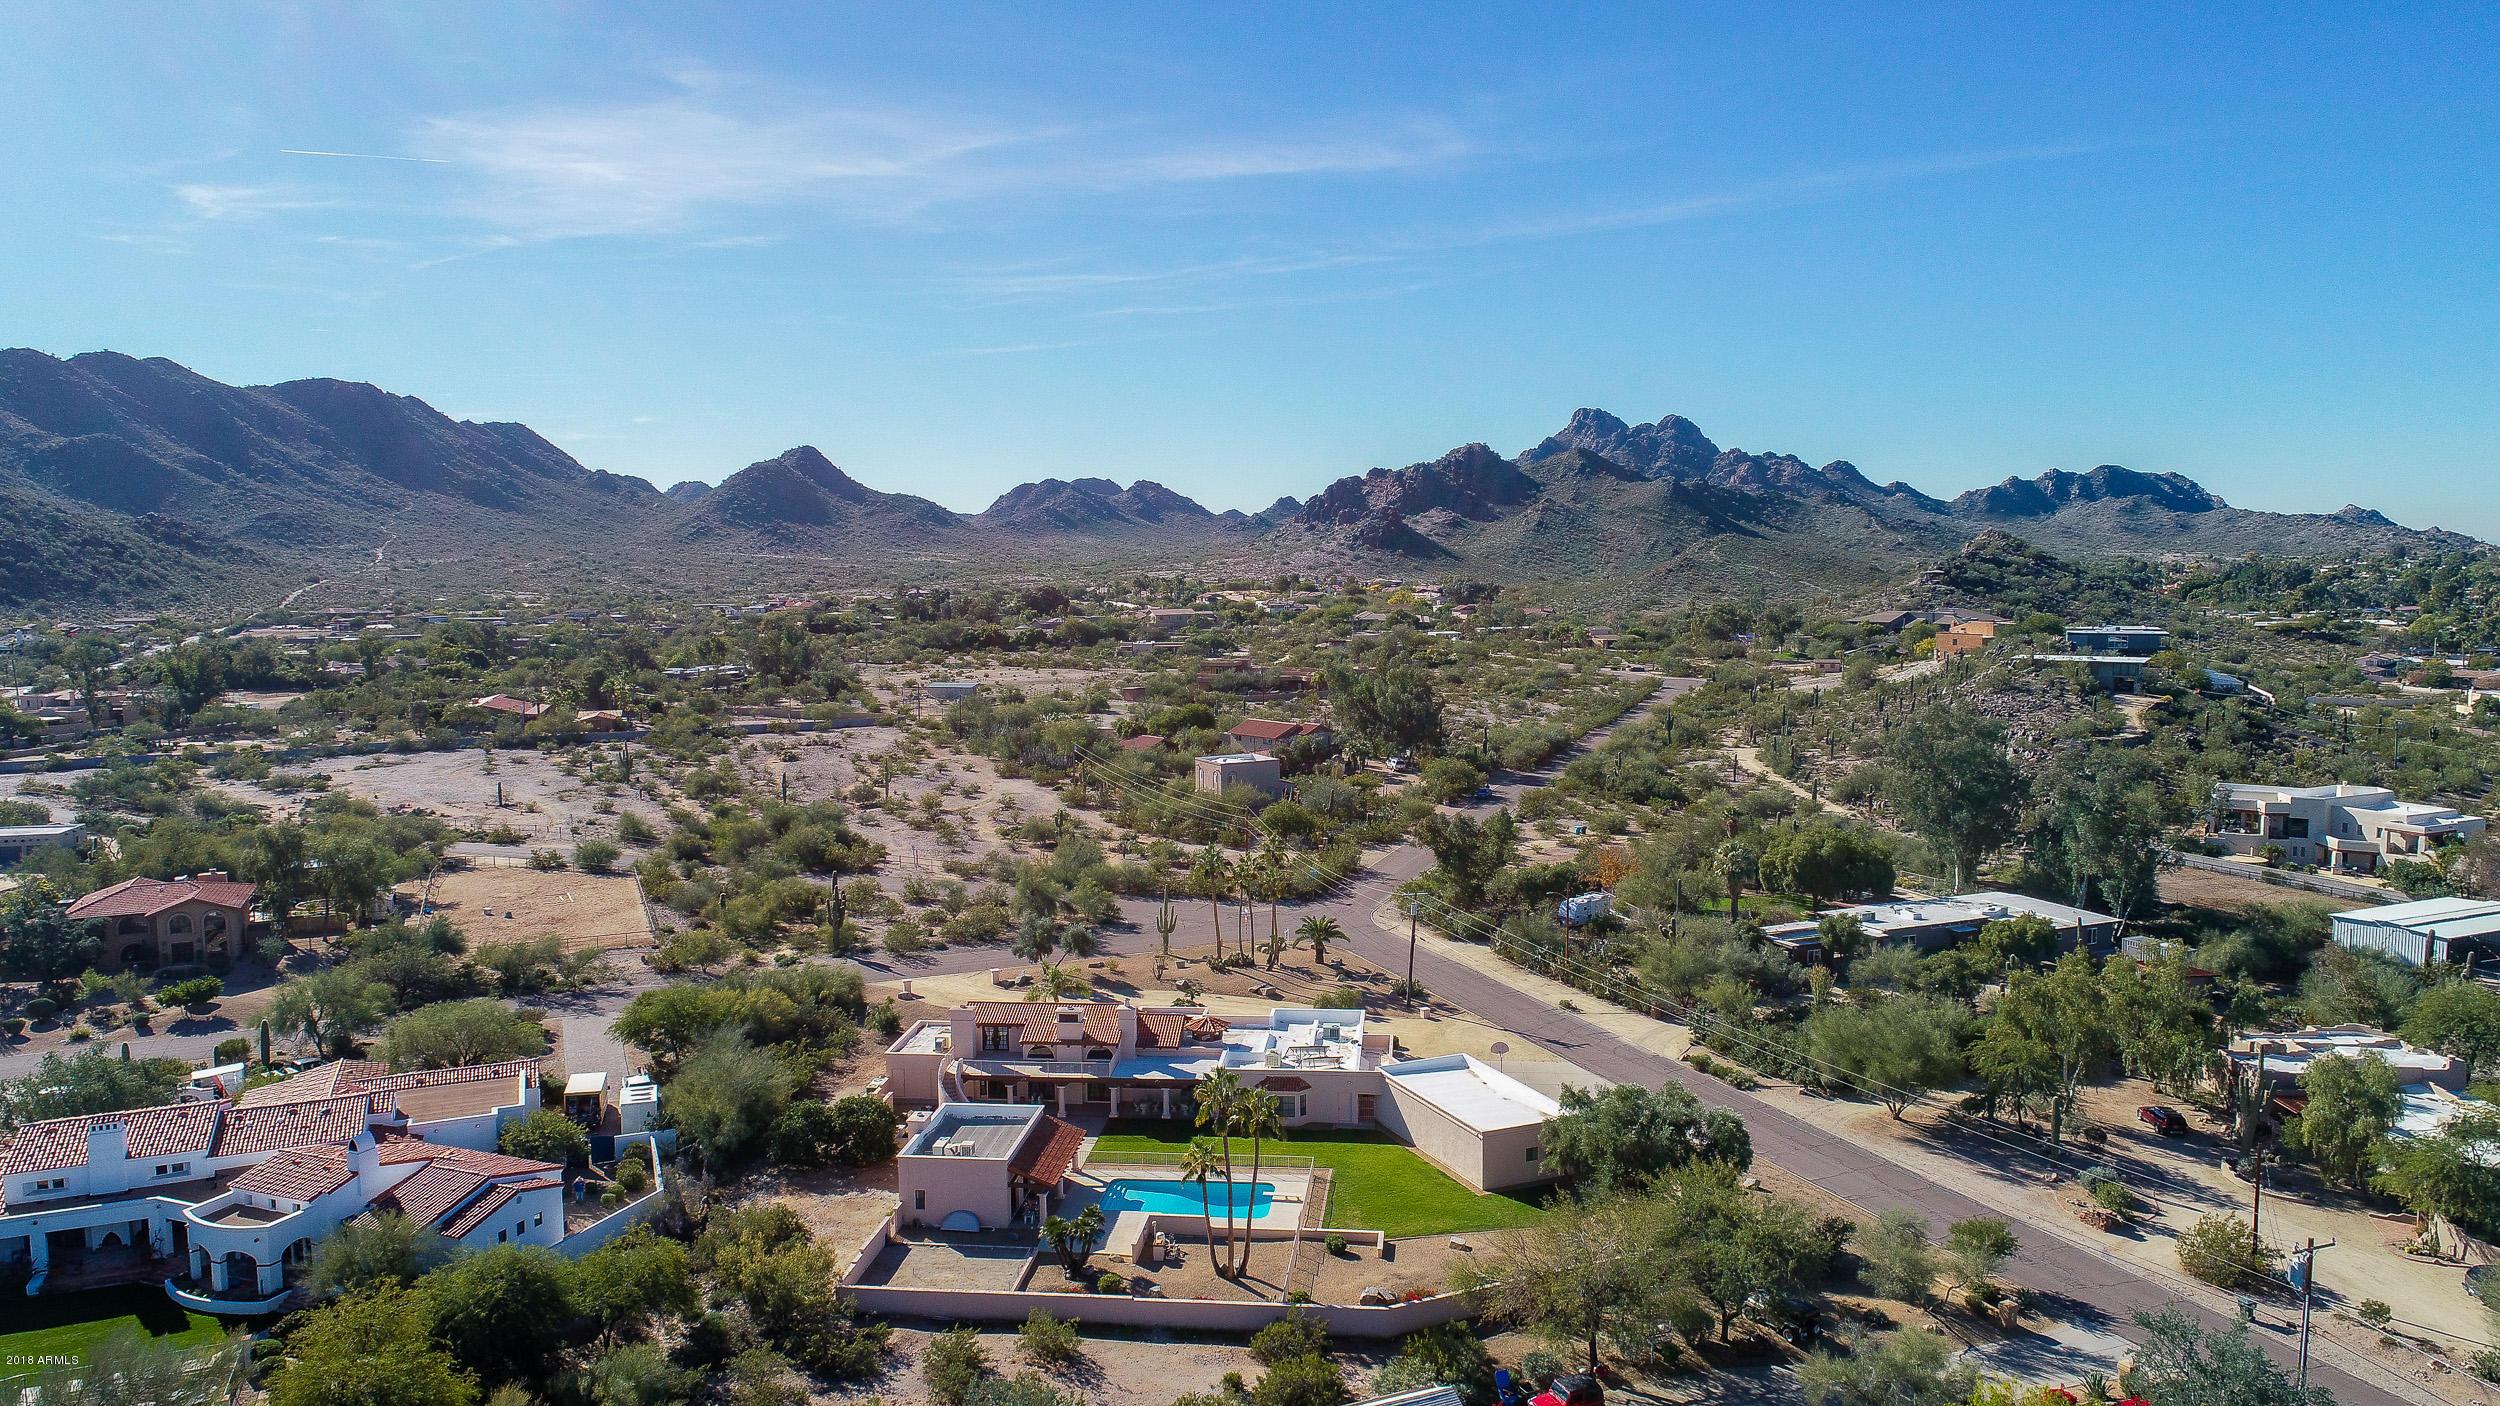 MLS 5857434 3902 E MOUNTAIN VIEW Road, Phoenix, AZ 85028 Phoenix AZ Equestrian